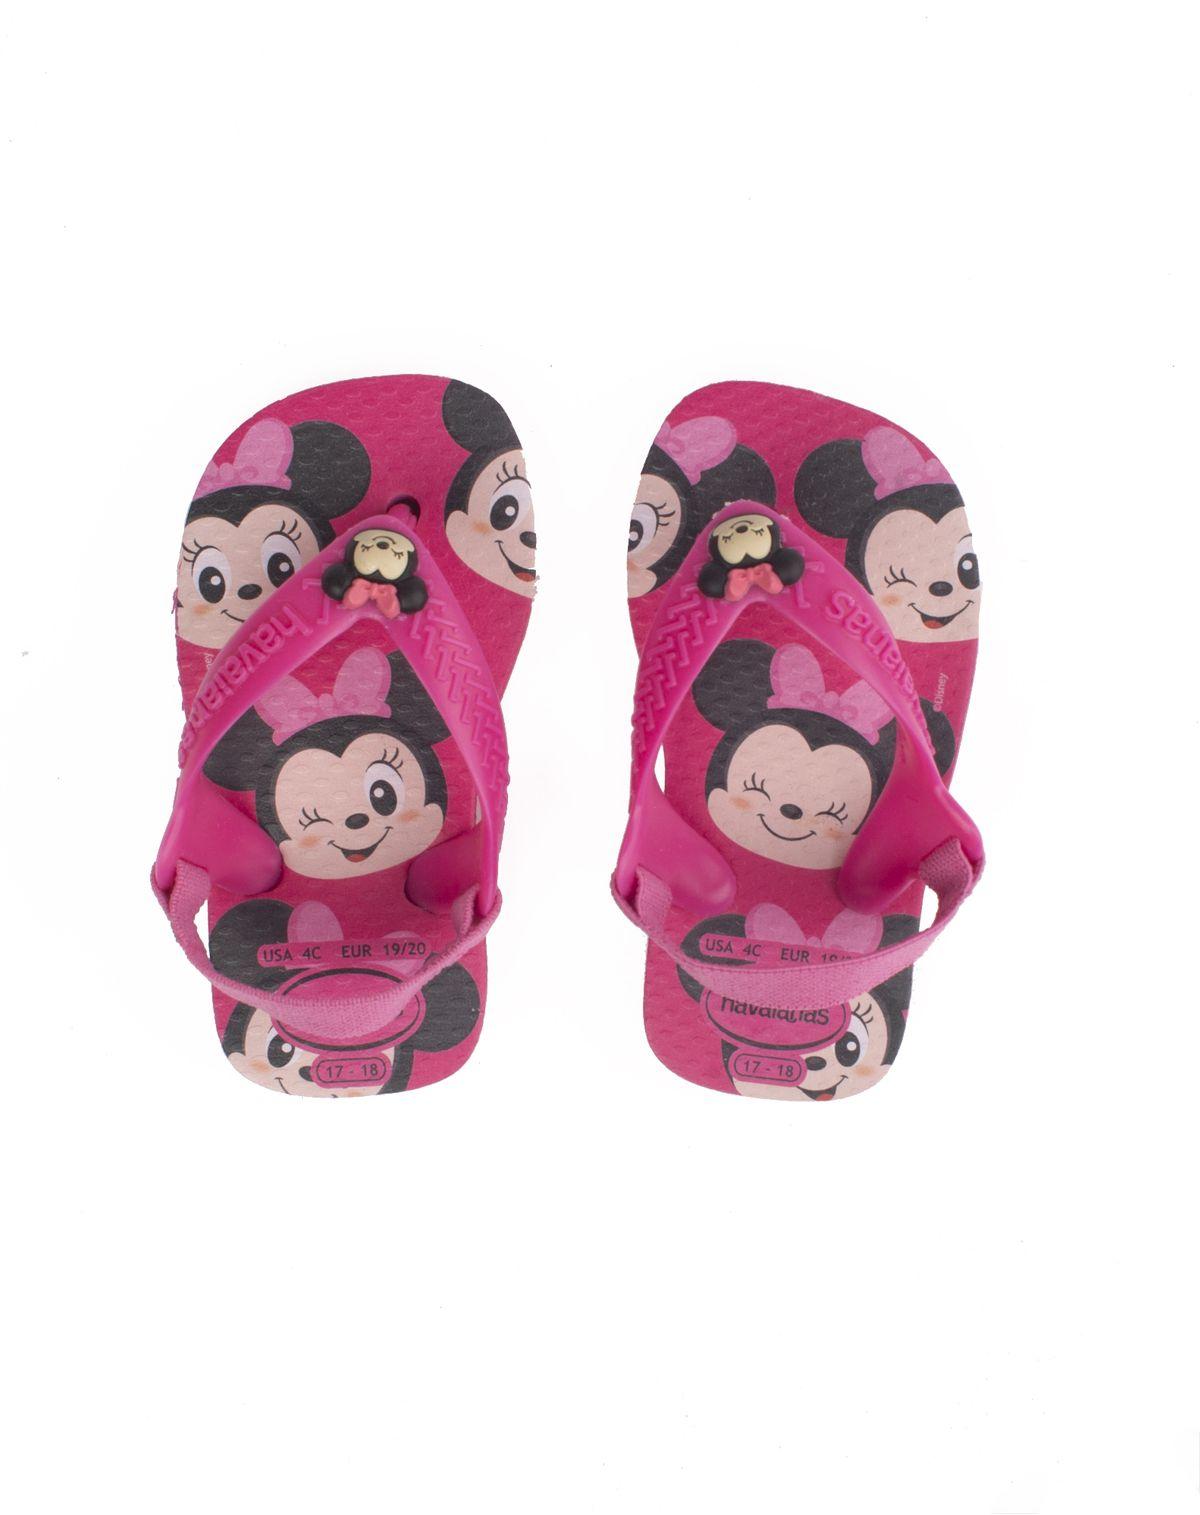 558960002-sandalia-bebe-havaianas-disnney-classics-rosa-19-333